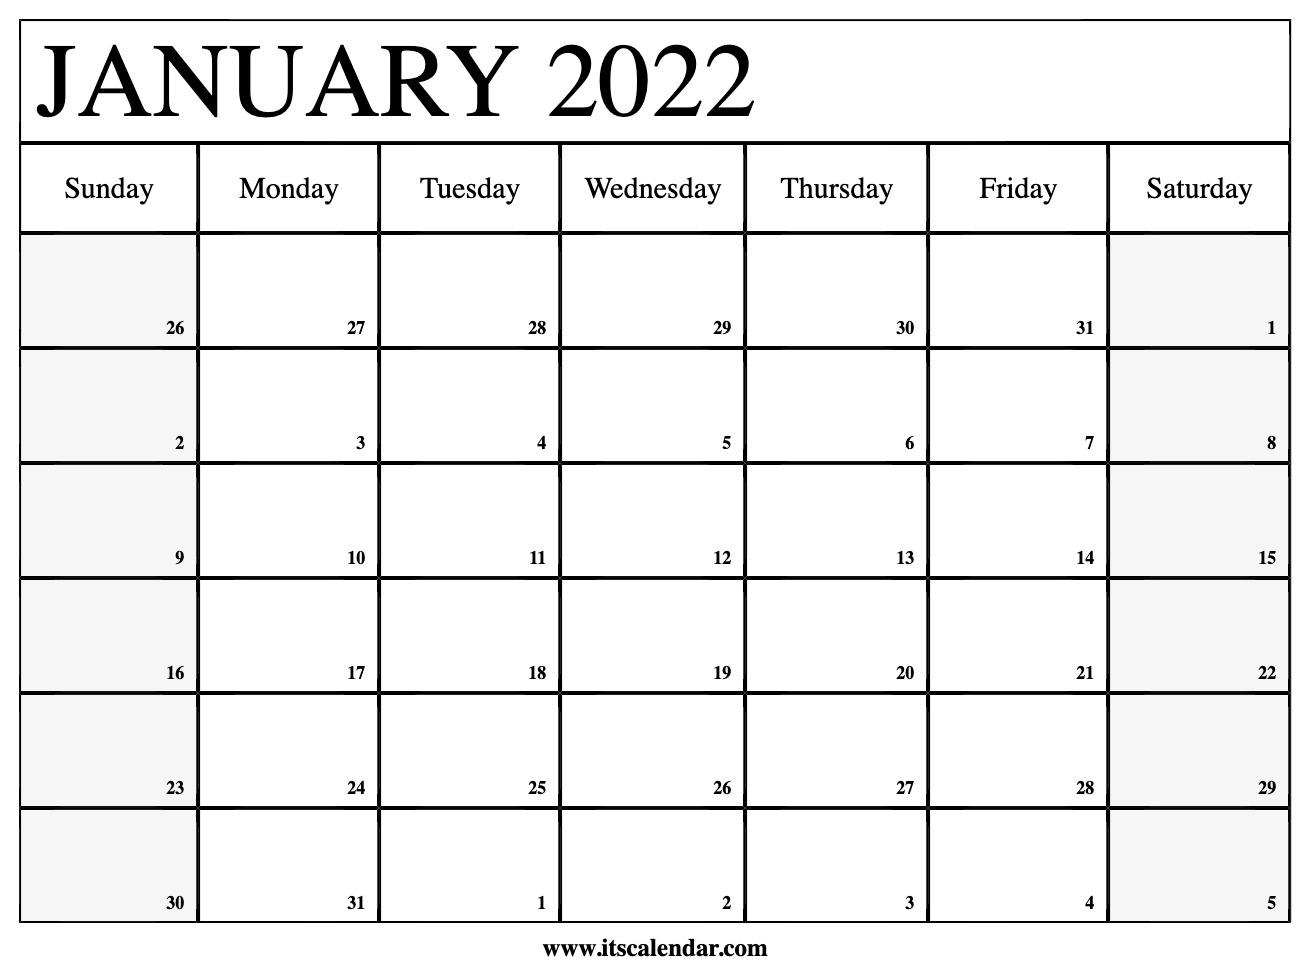 Free Printable January 2022 Calendar Pertaining To Monthly Calendar 2022 January